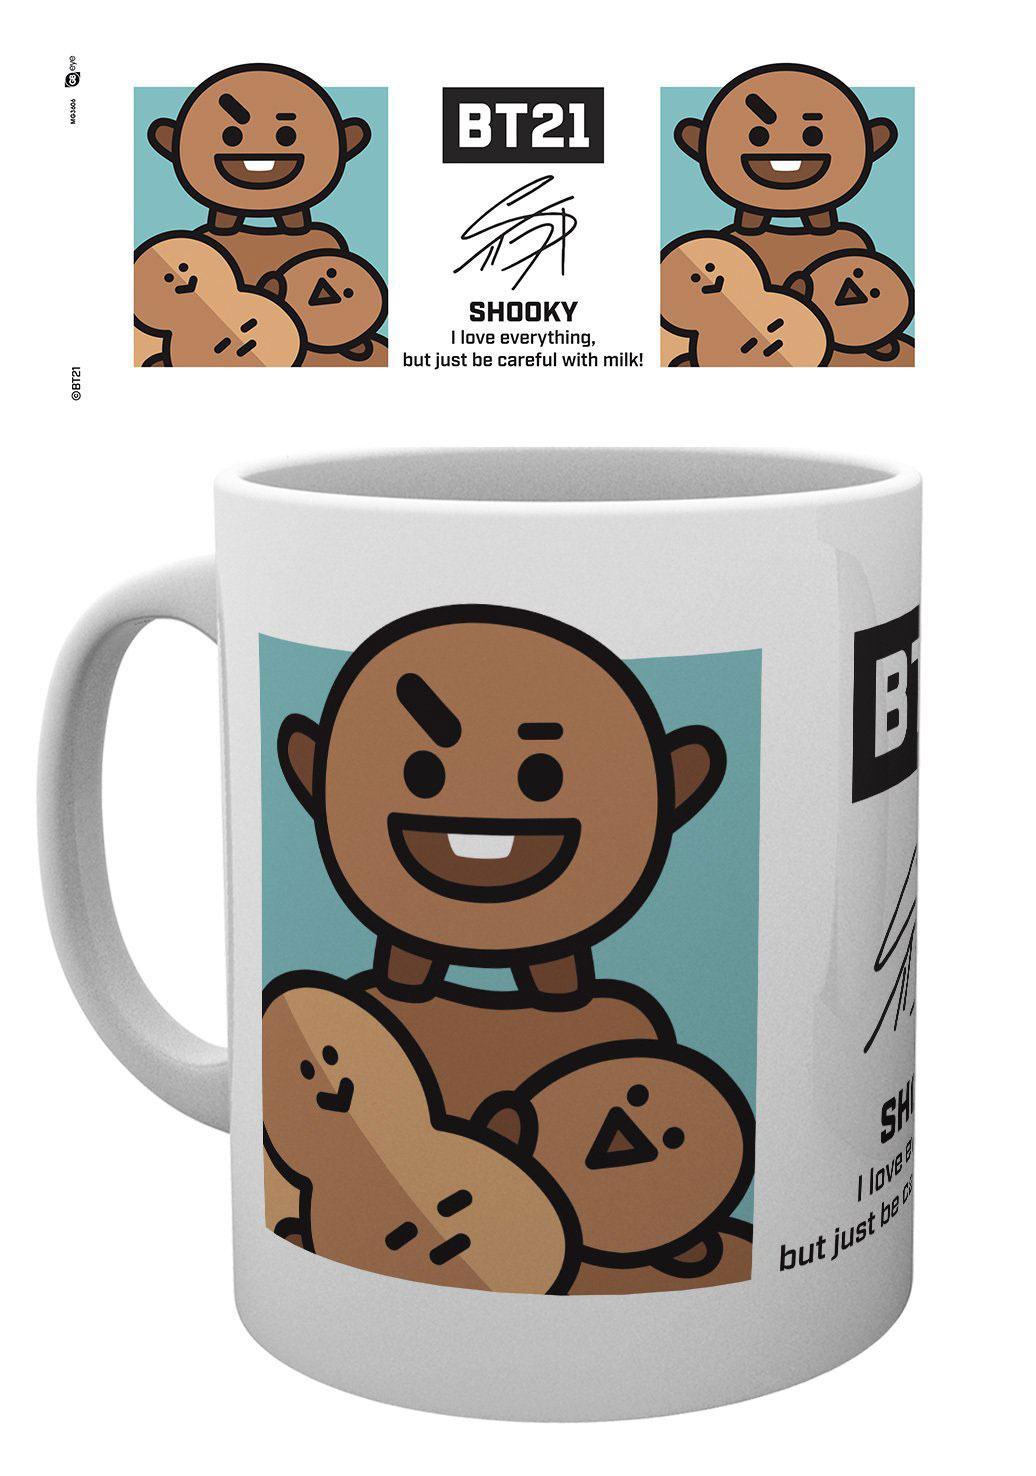 BT21 Mug Shooky